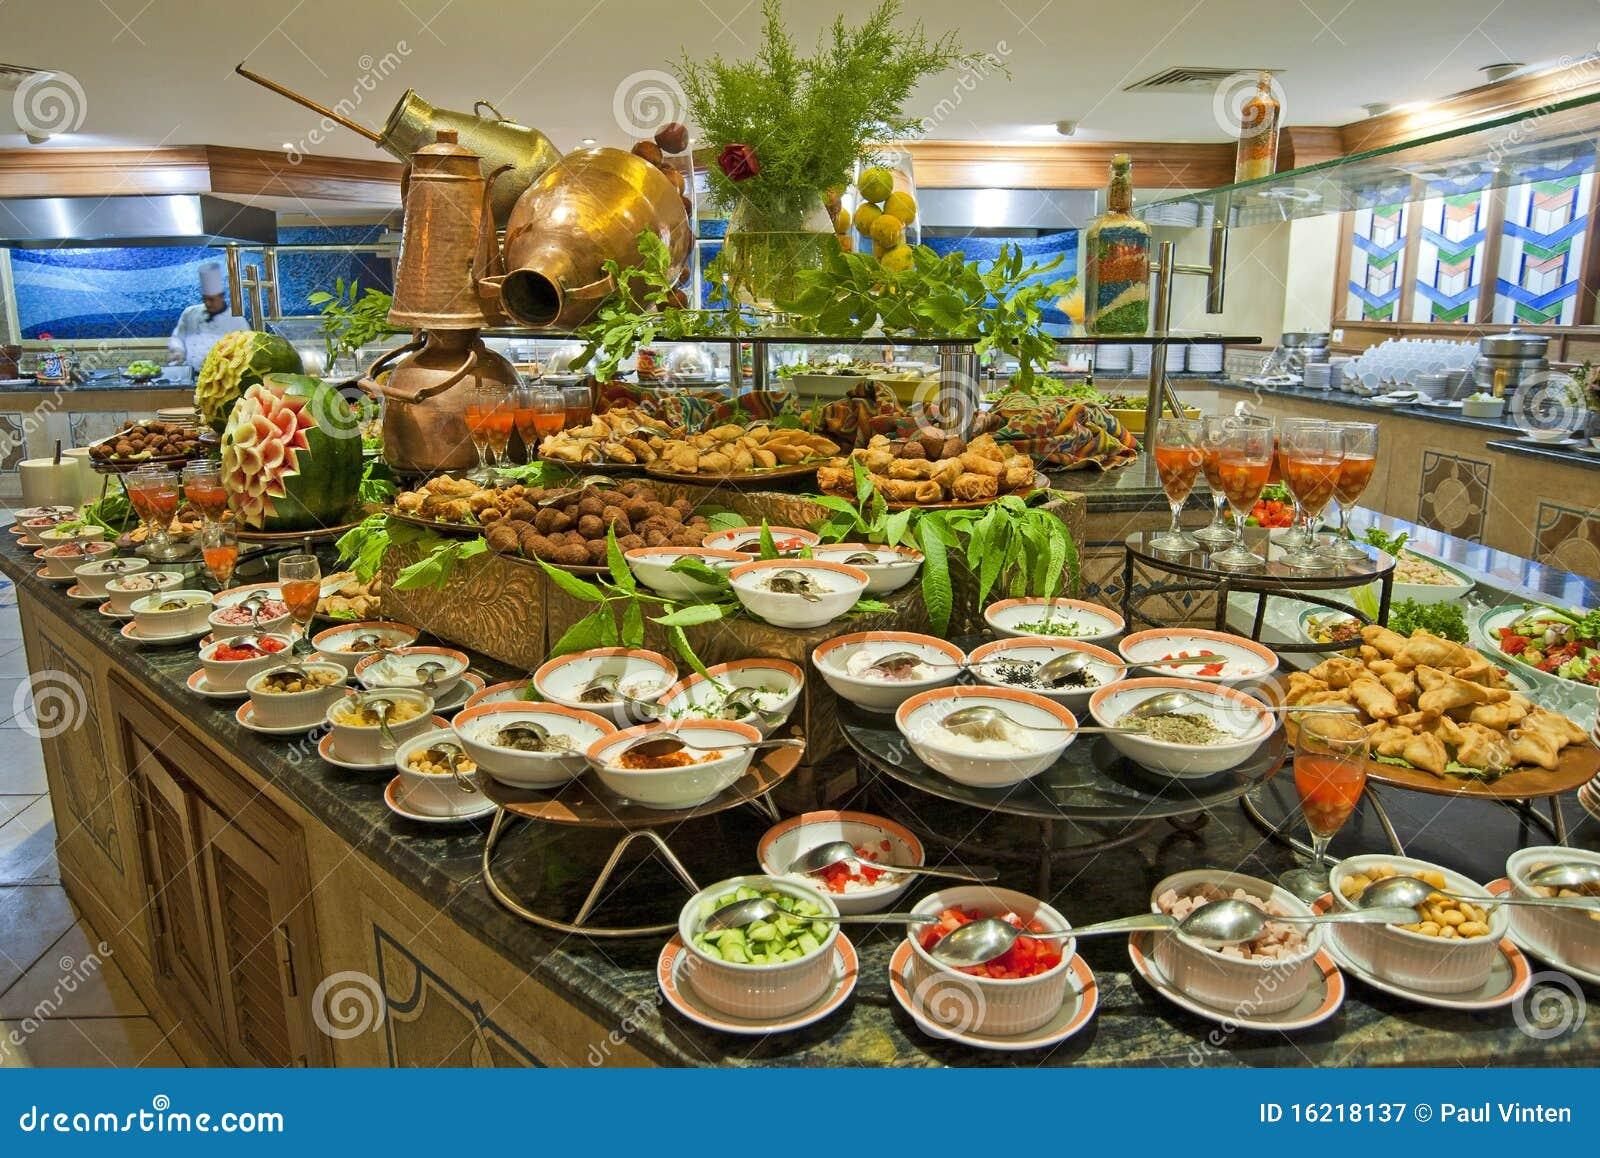 Salad Buffet In A Luxury Hotel Restaurant Royalty Free